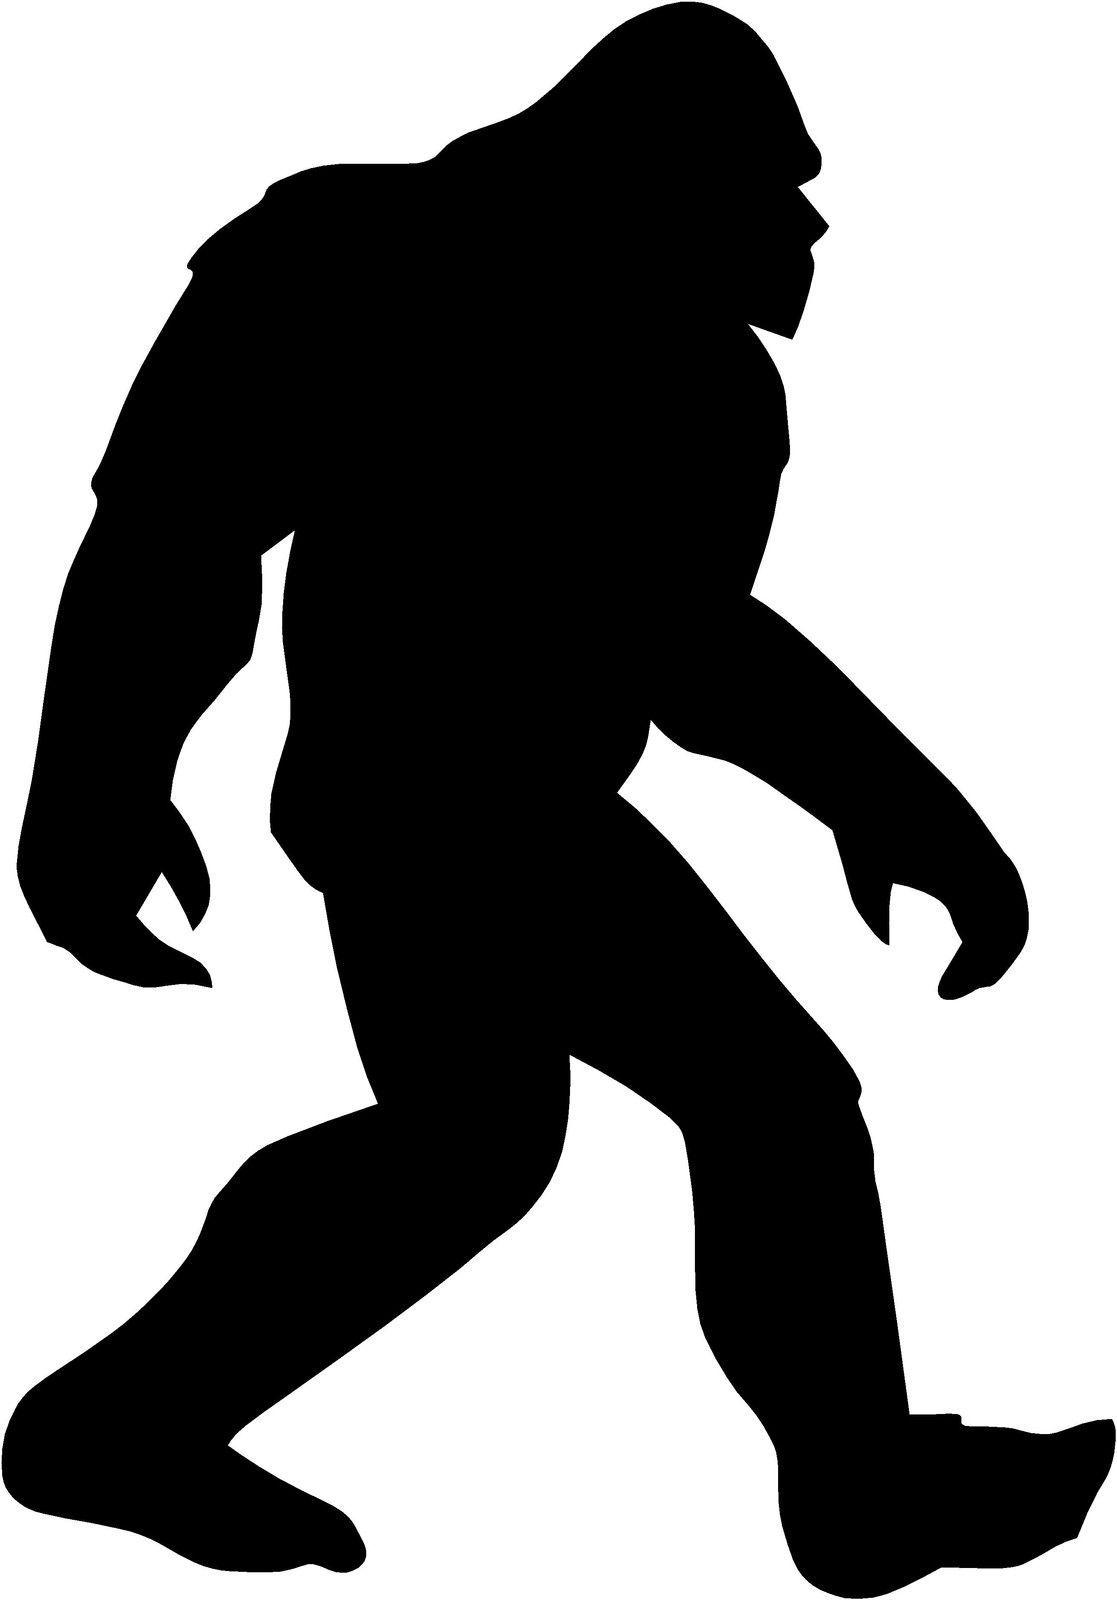 bigfoot sasquatch yeti decal 5 75 x3 75 choose color products rh pinterest com bigfoot clip art monsters bigfoot clip art free